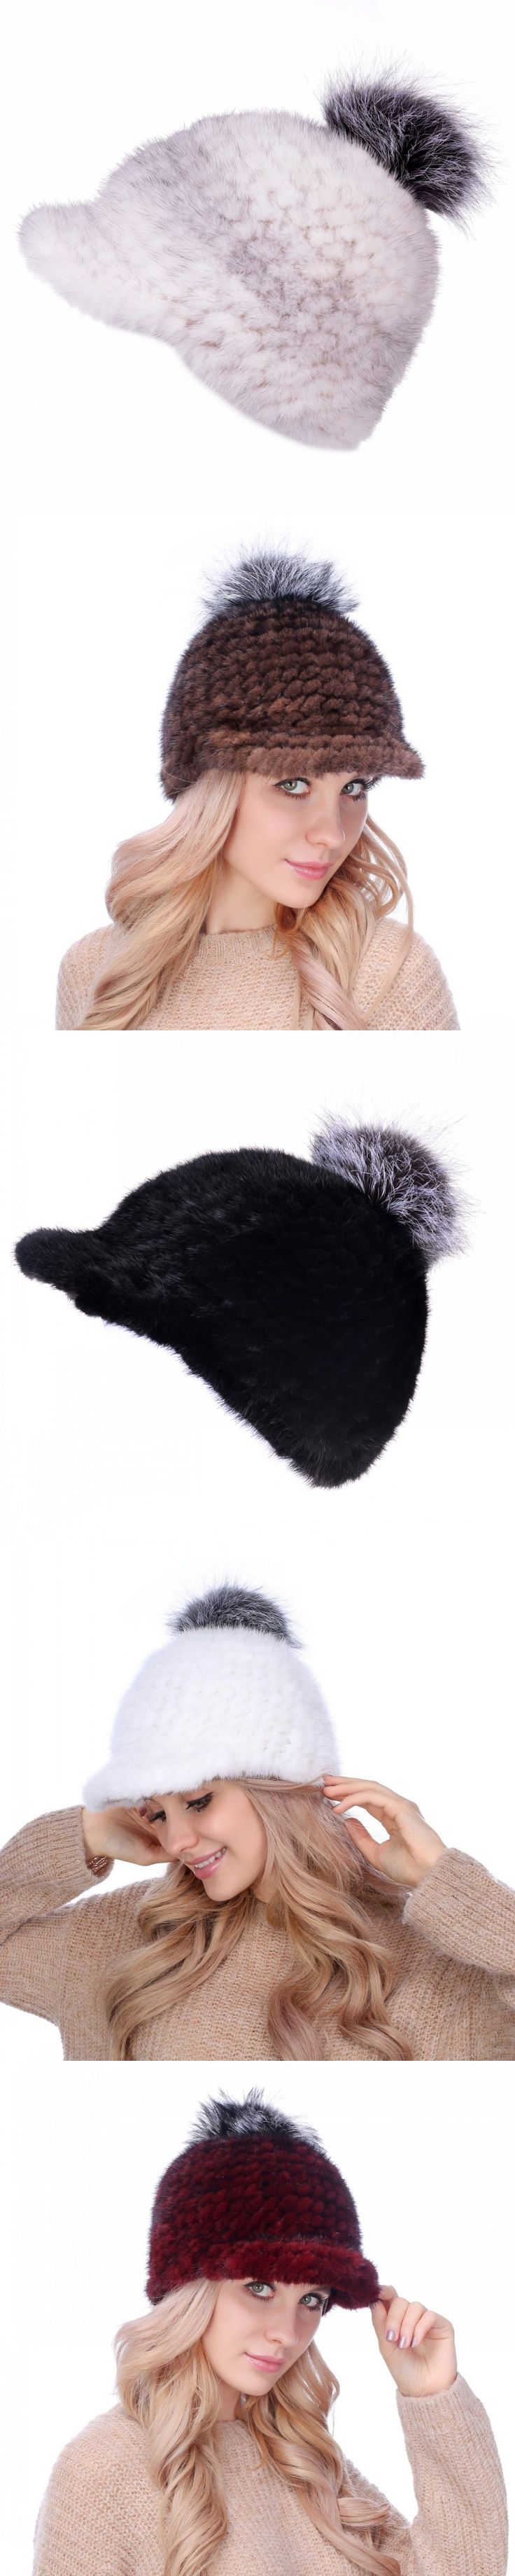 The new leisure mink hat Leather Hat Korean lady fox ball ball cap warm mink peaked cap